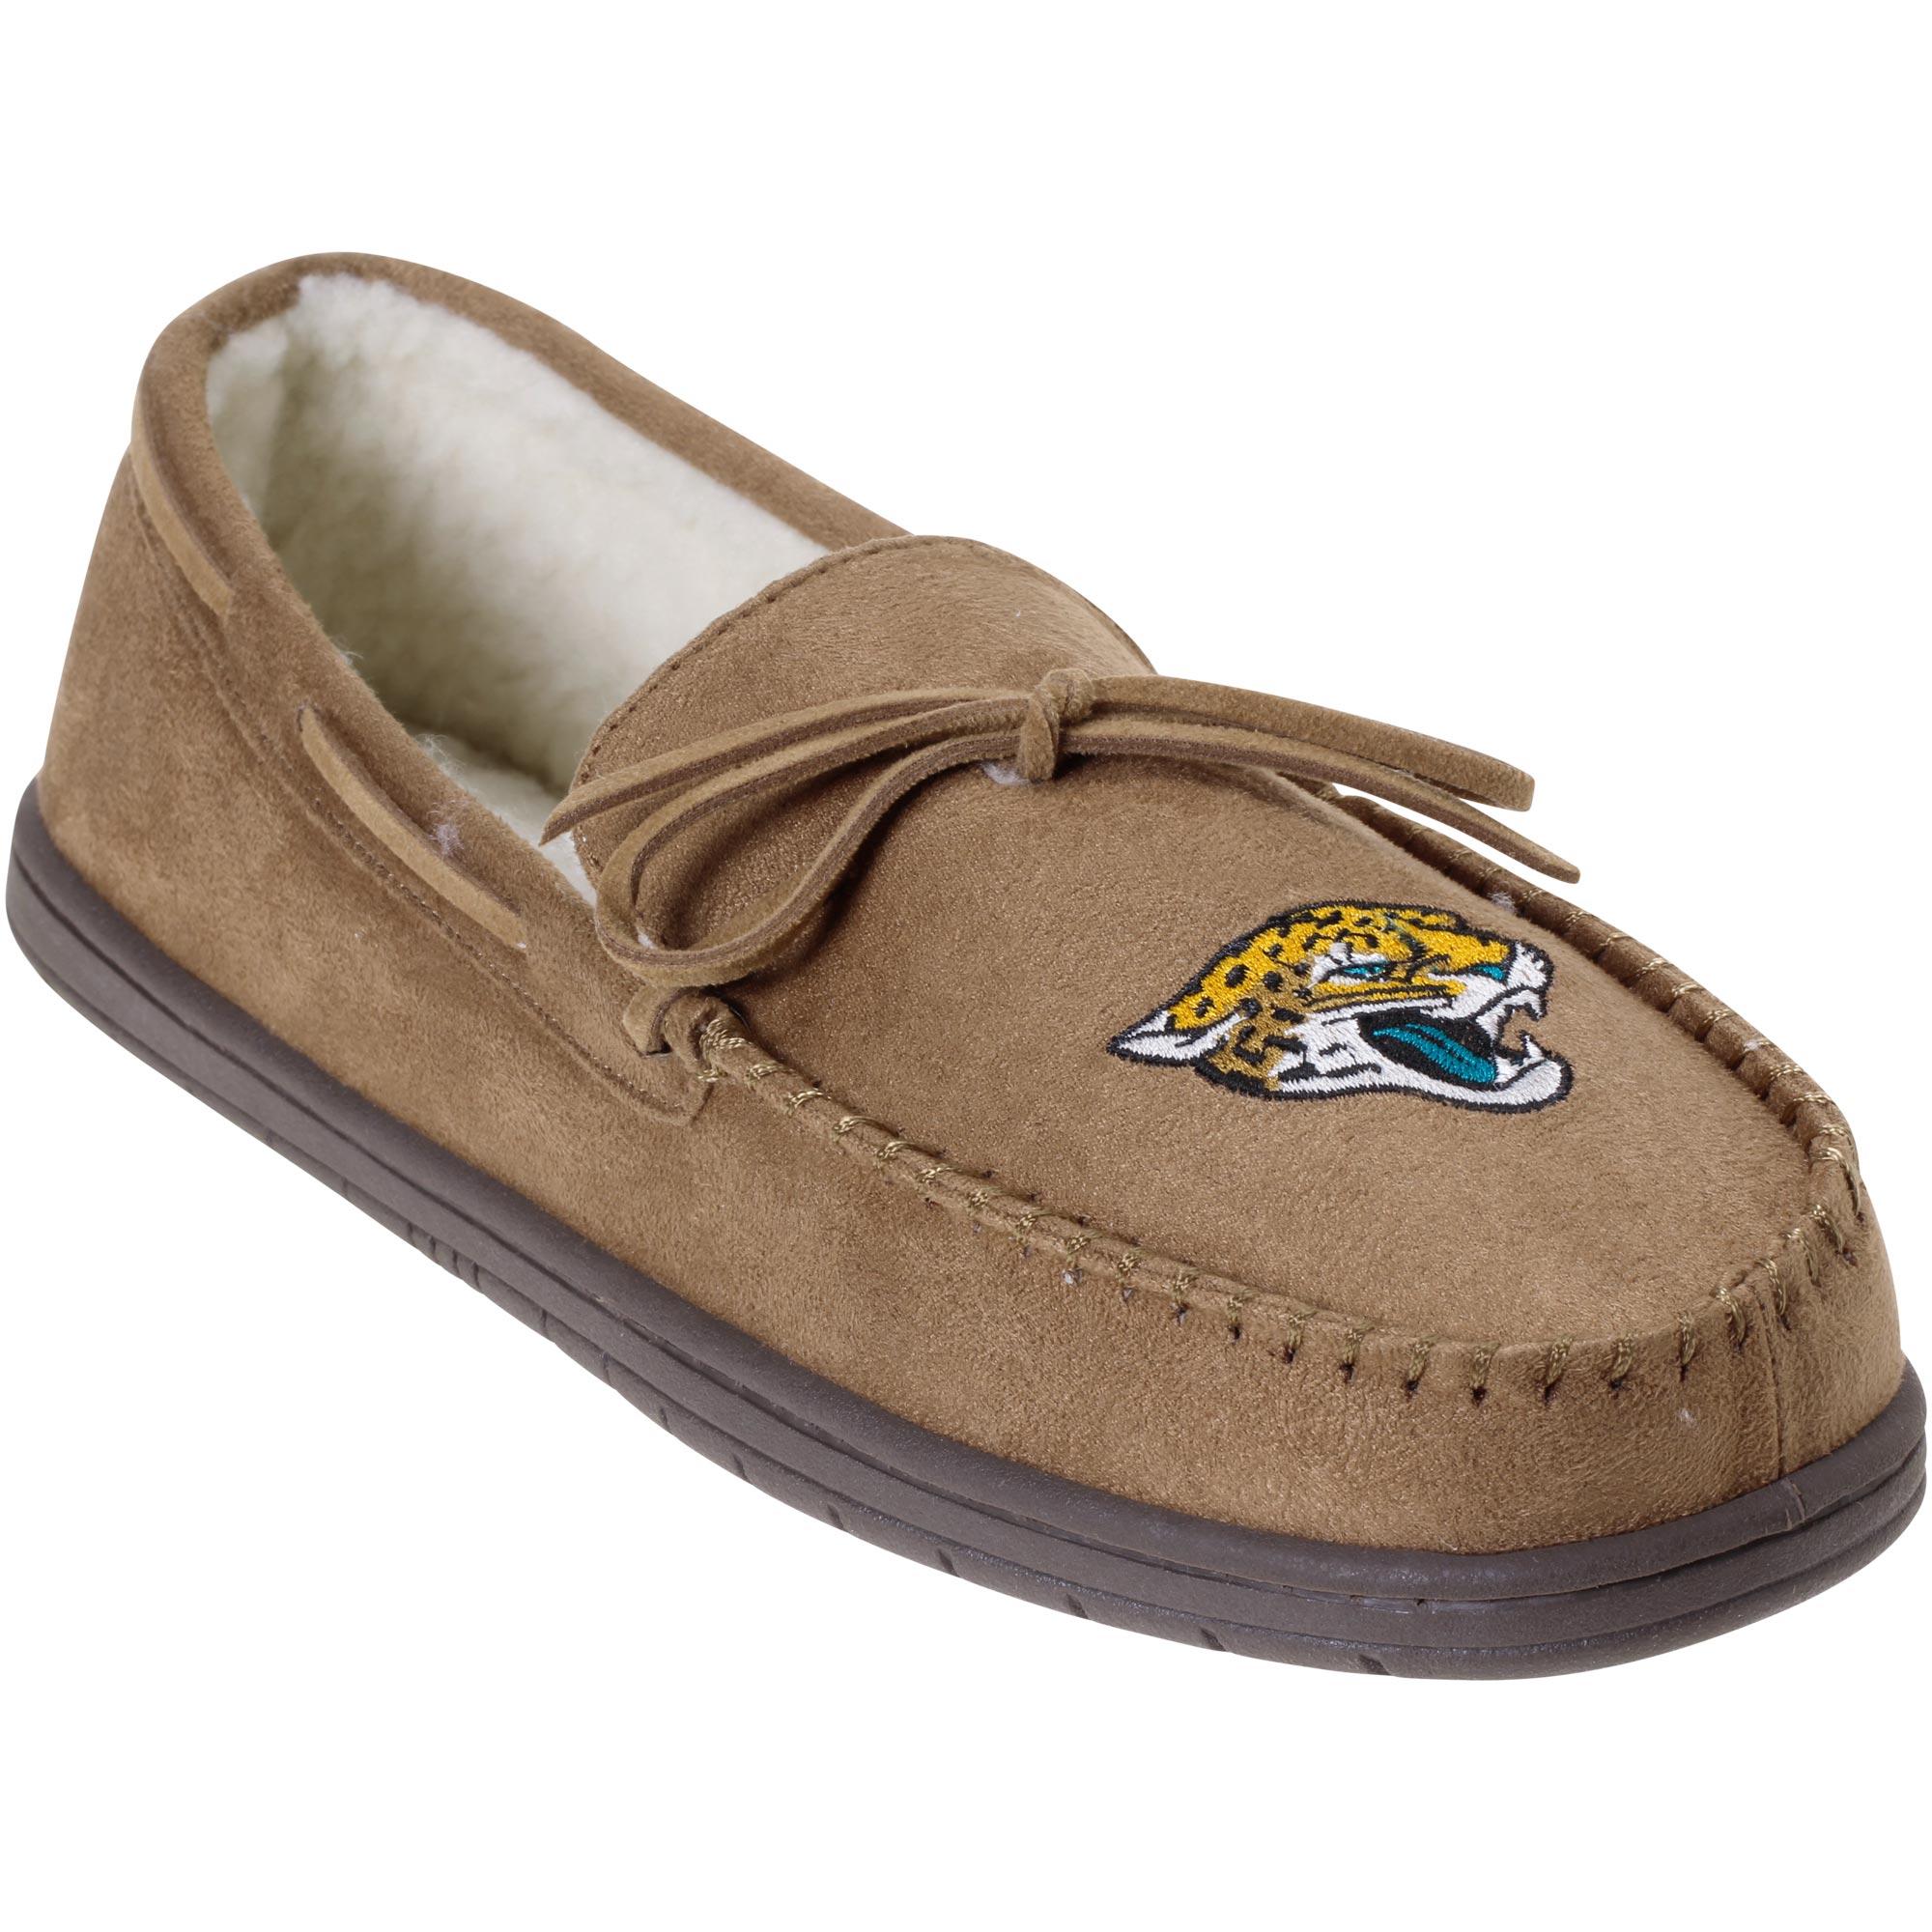 Jacksonville Jaguars Moccasin Slippers